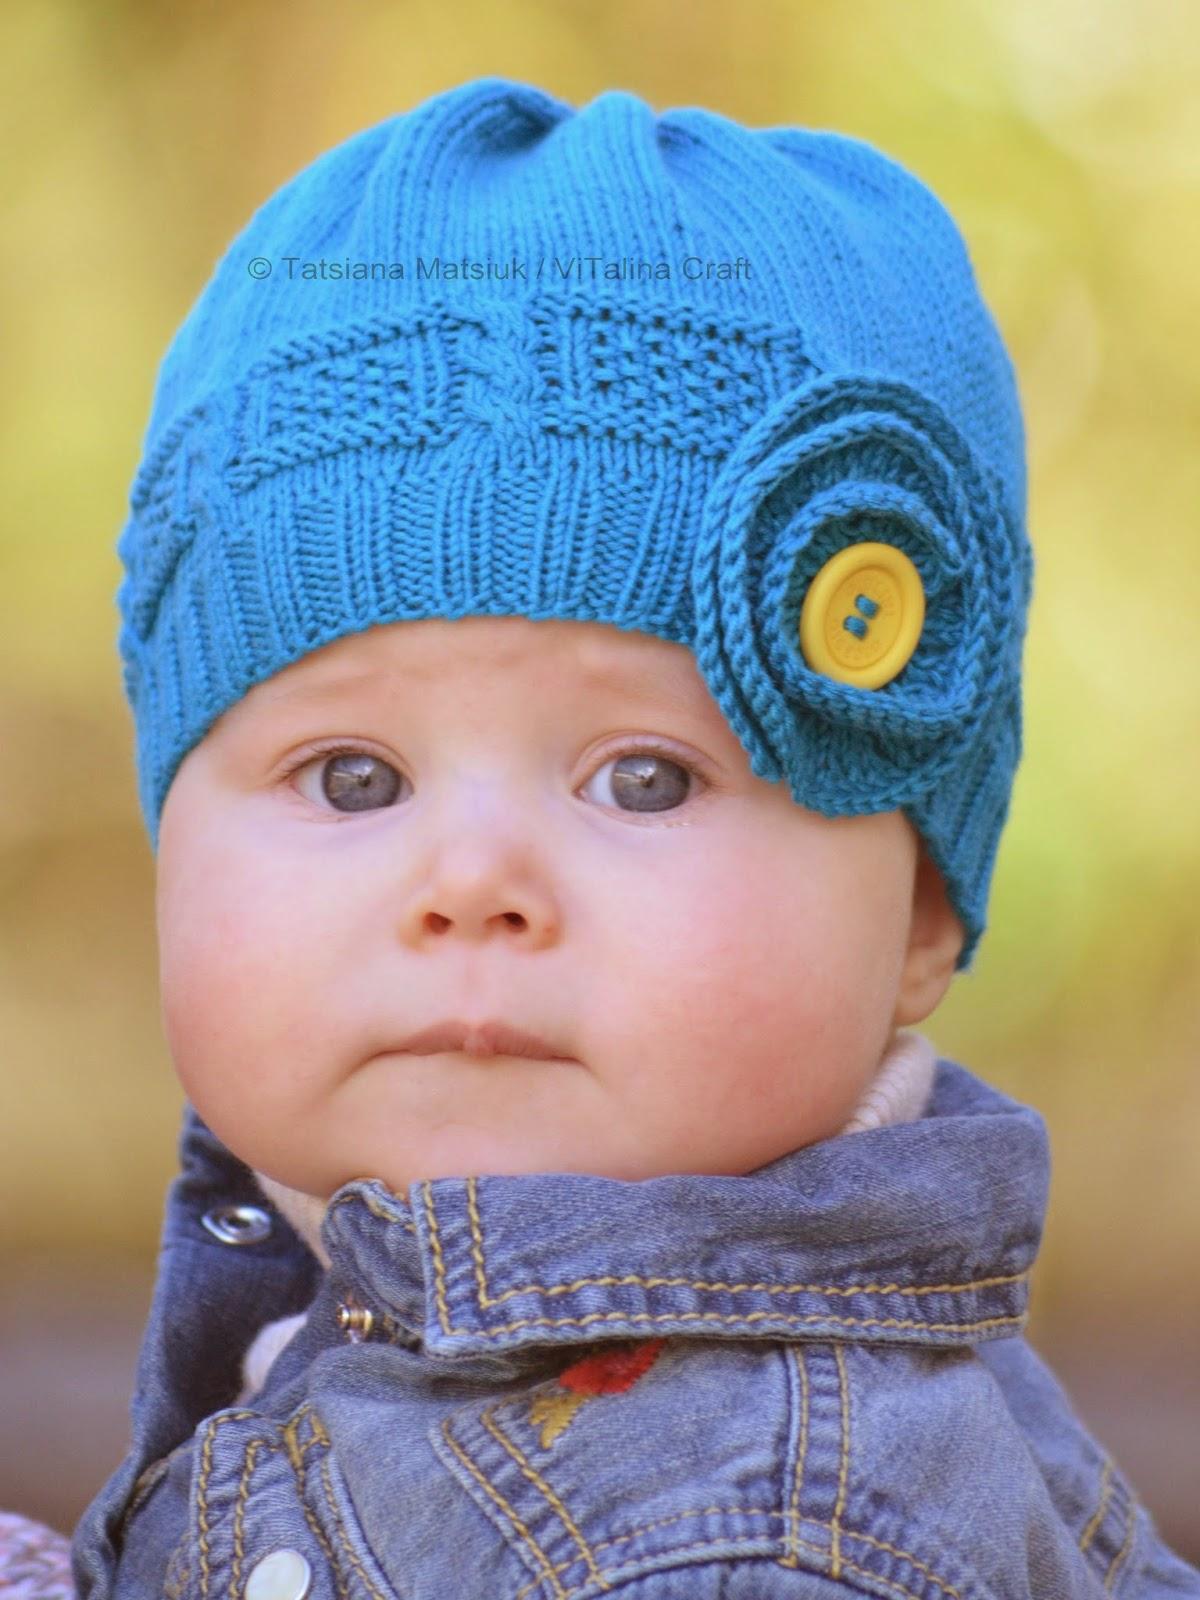 Azure Twist Flower Baby Hat Knitting Pattern   ViTalina Craft